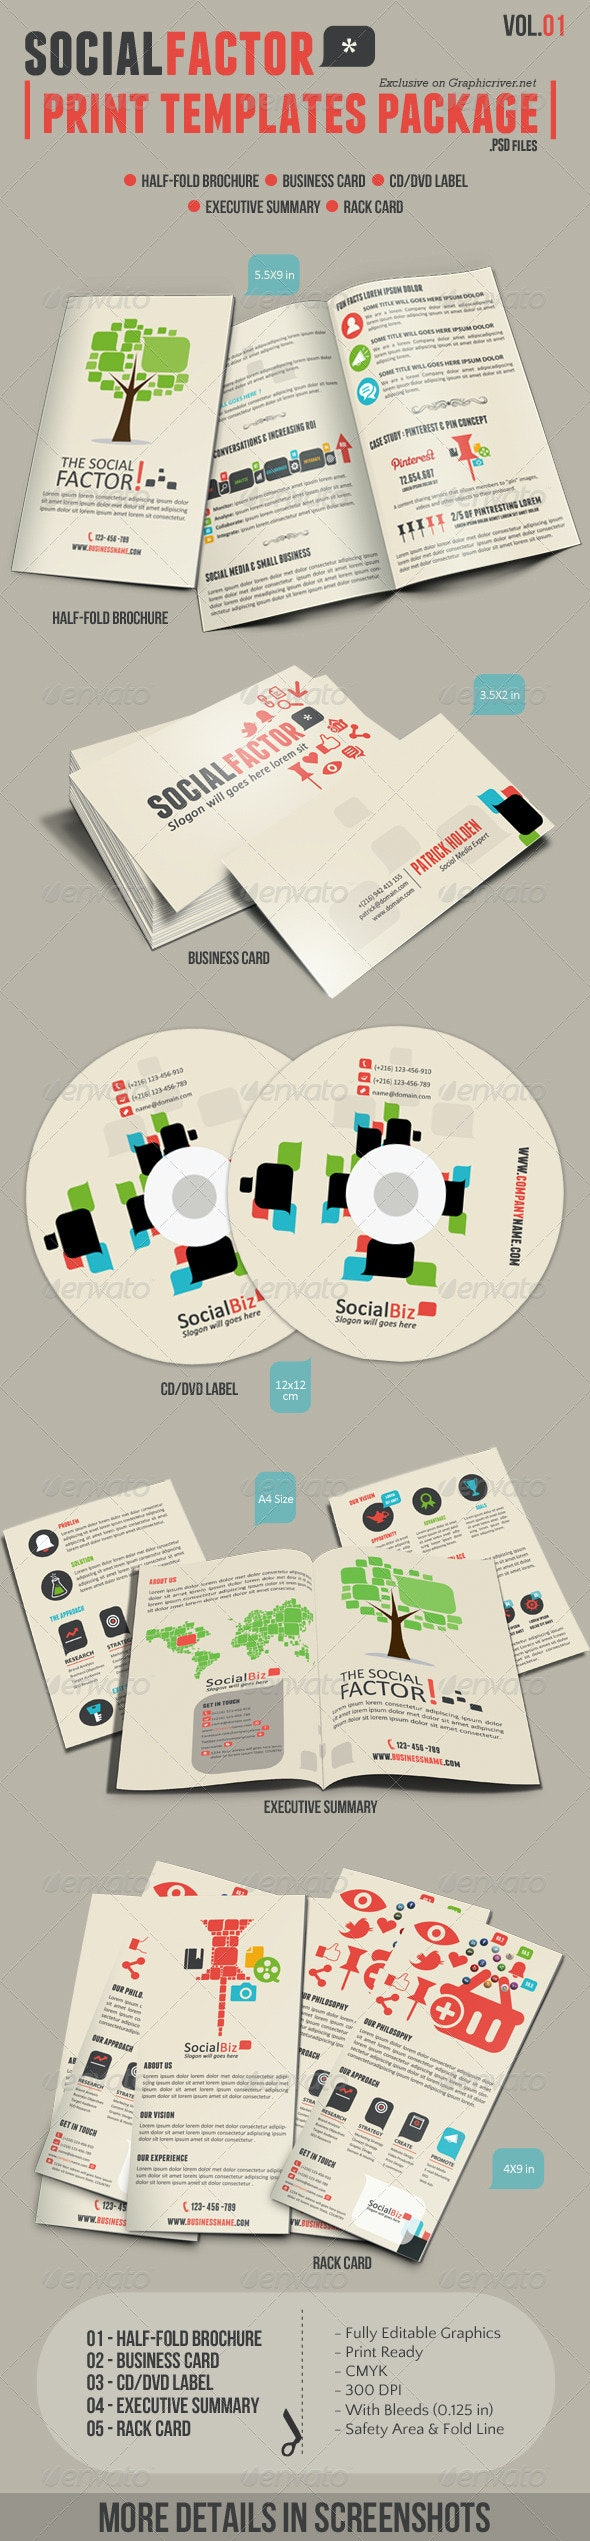 SocialFactor Print Templates Package Vol.01 - Stationery Print Templates